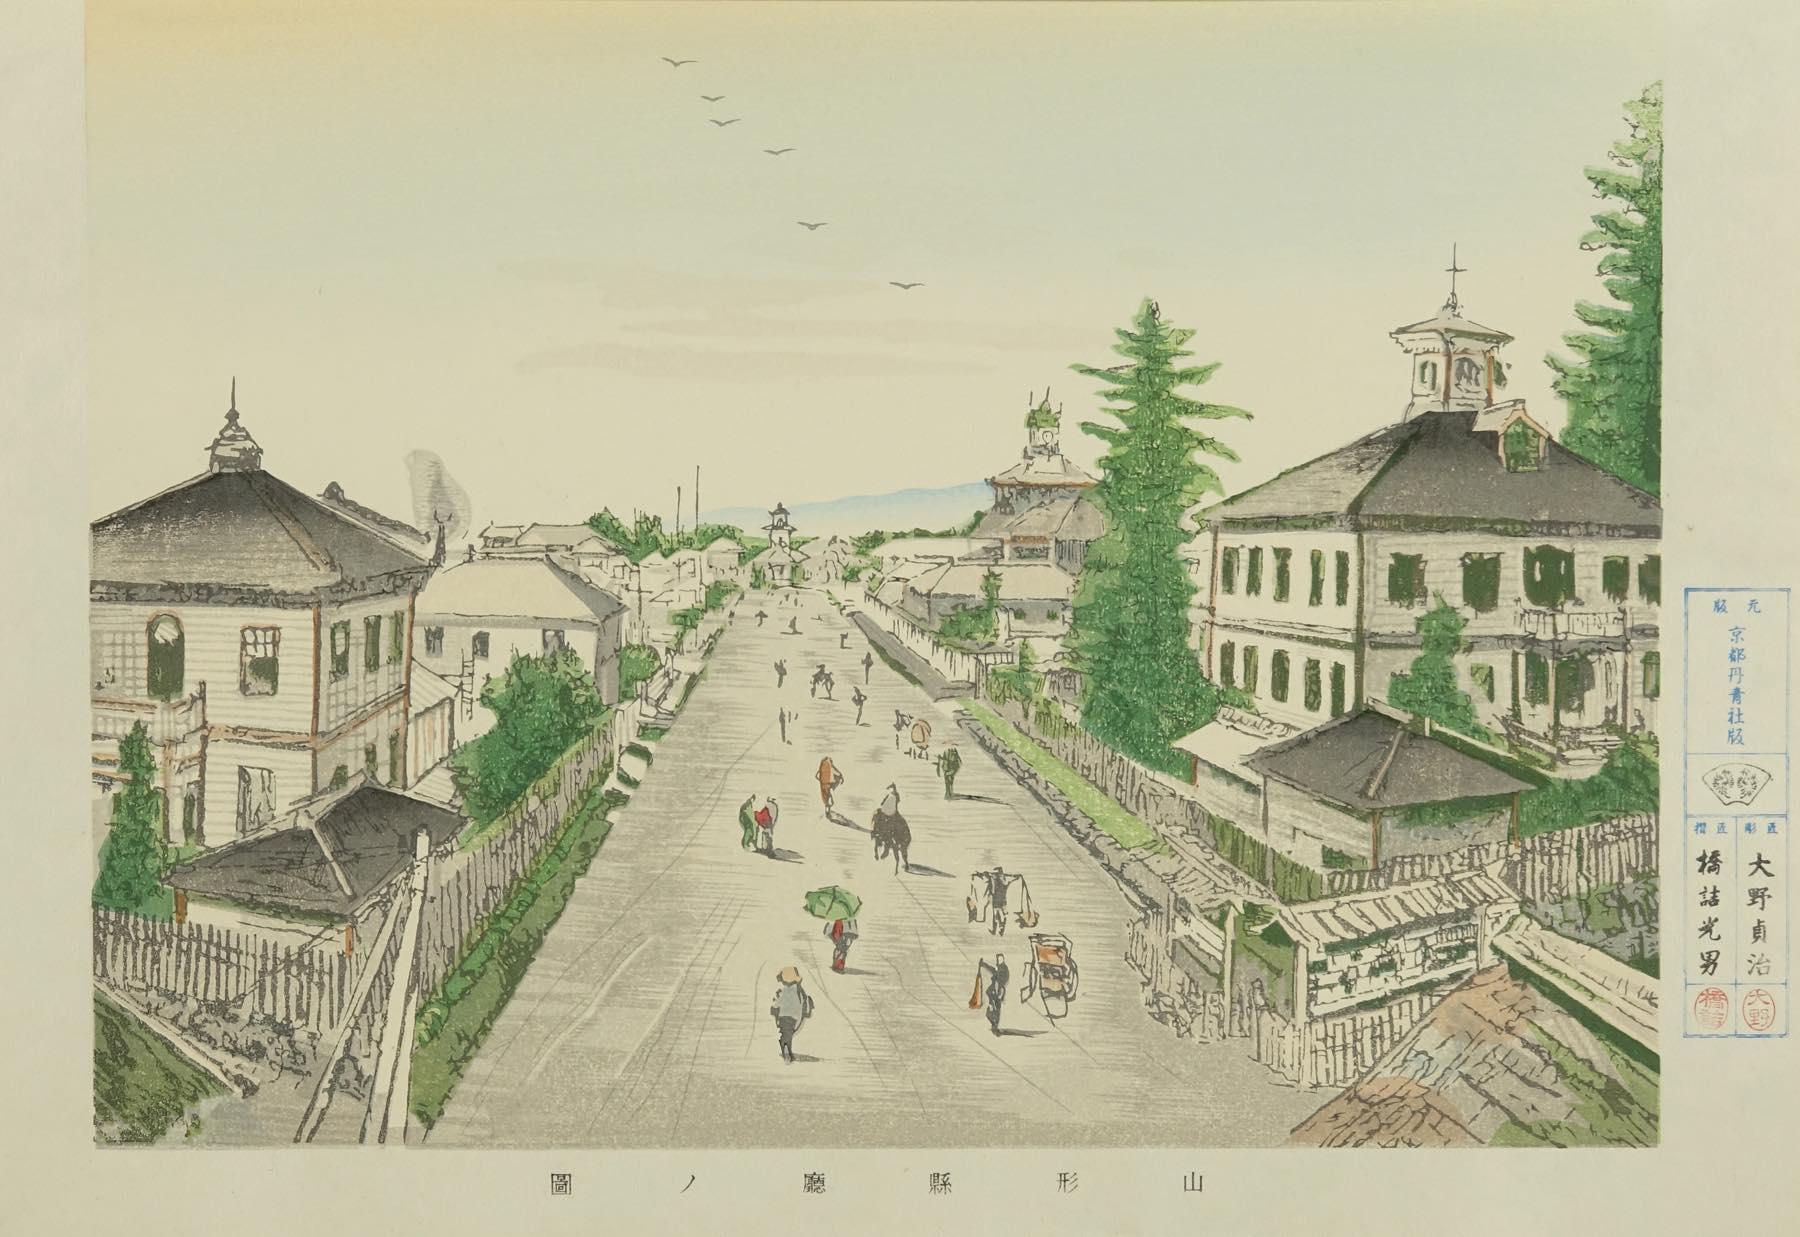 高橋由一 近代山形県のあけぼの 手刷複製木版画 24枚揃 丹青社 各約34.5x44.5cm. 台紙付 解説付 帙入